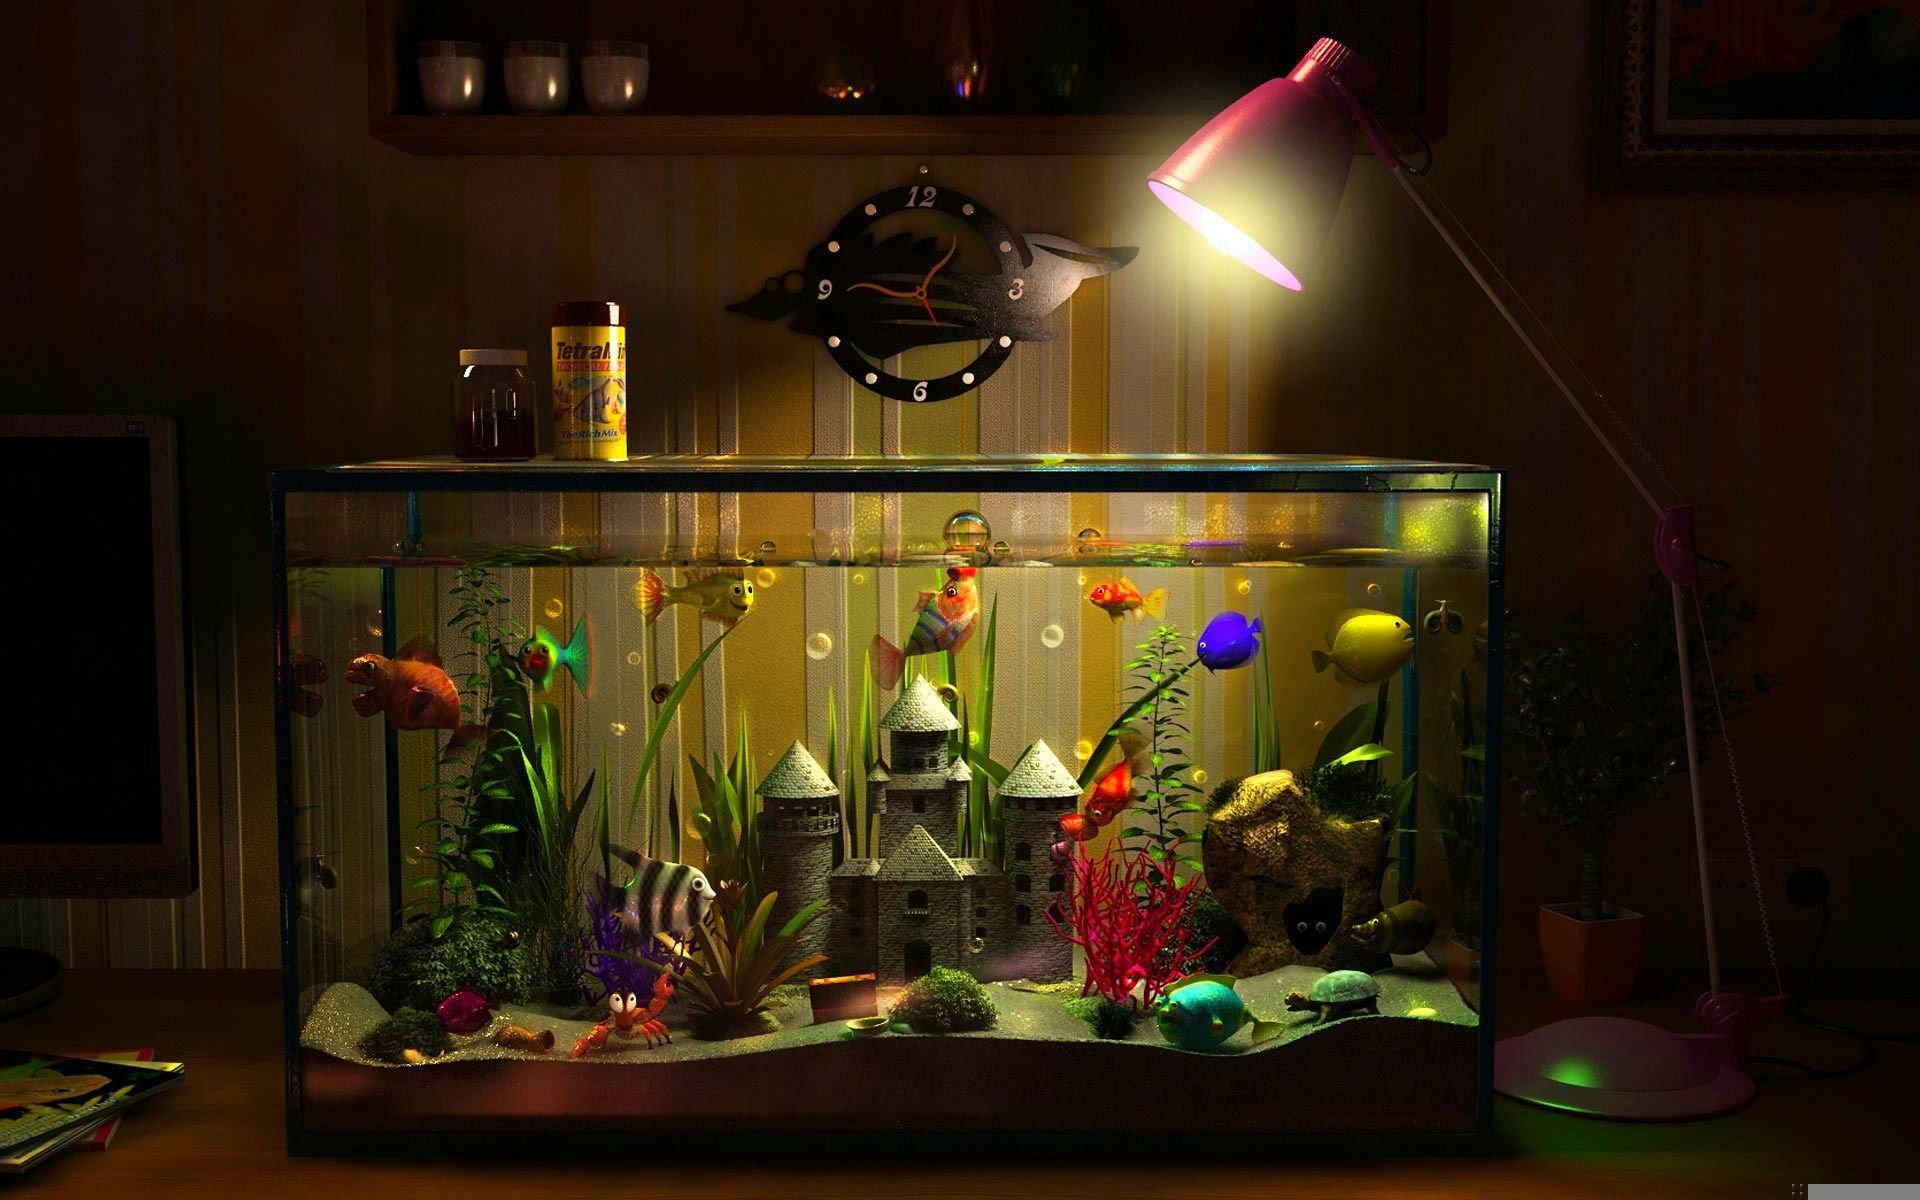 Fish Tank Hd Wallpaper Background Image 1920x1200